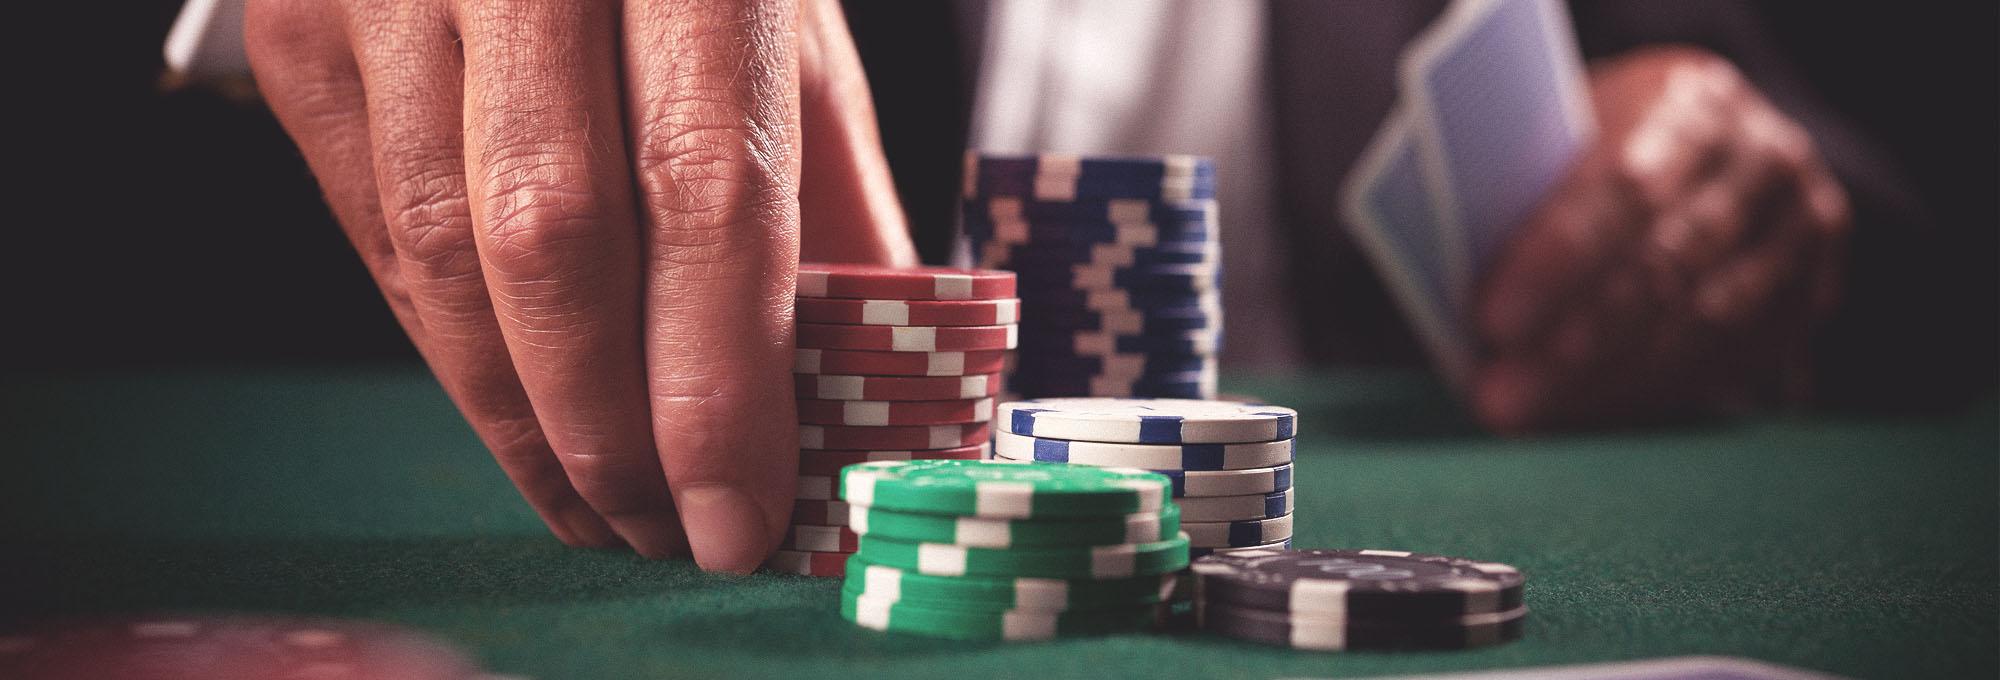 casino in glendale california